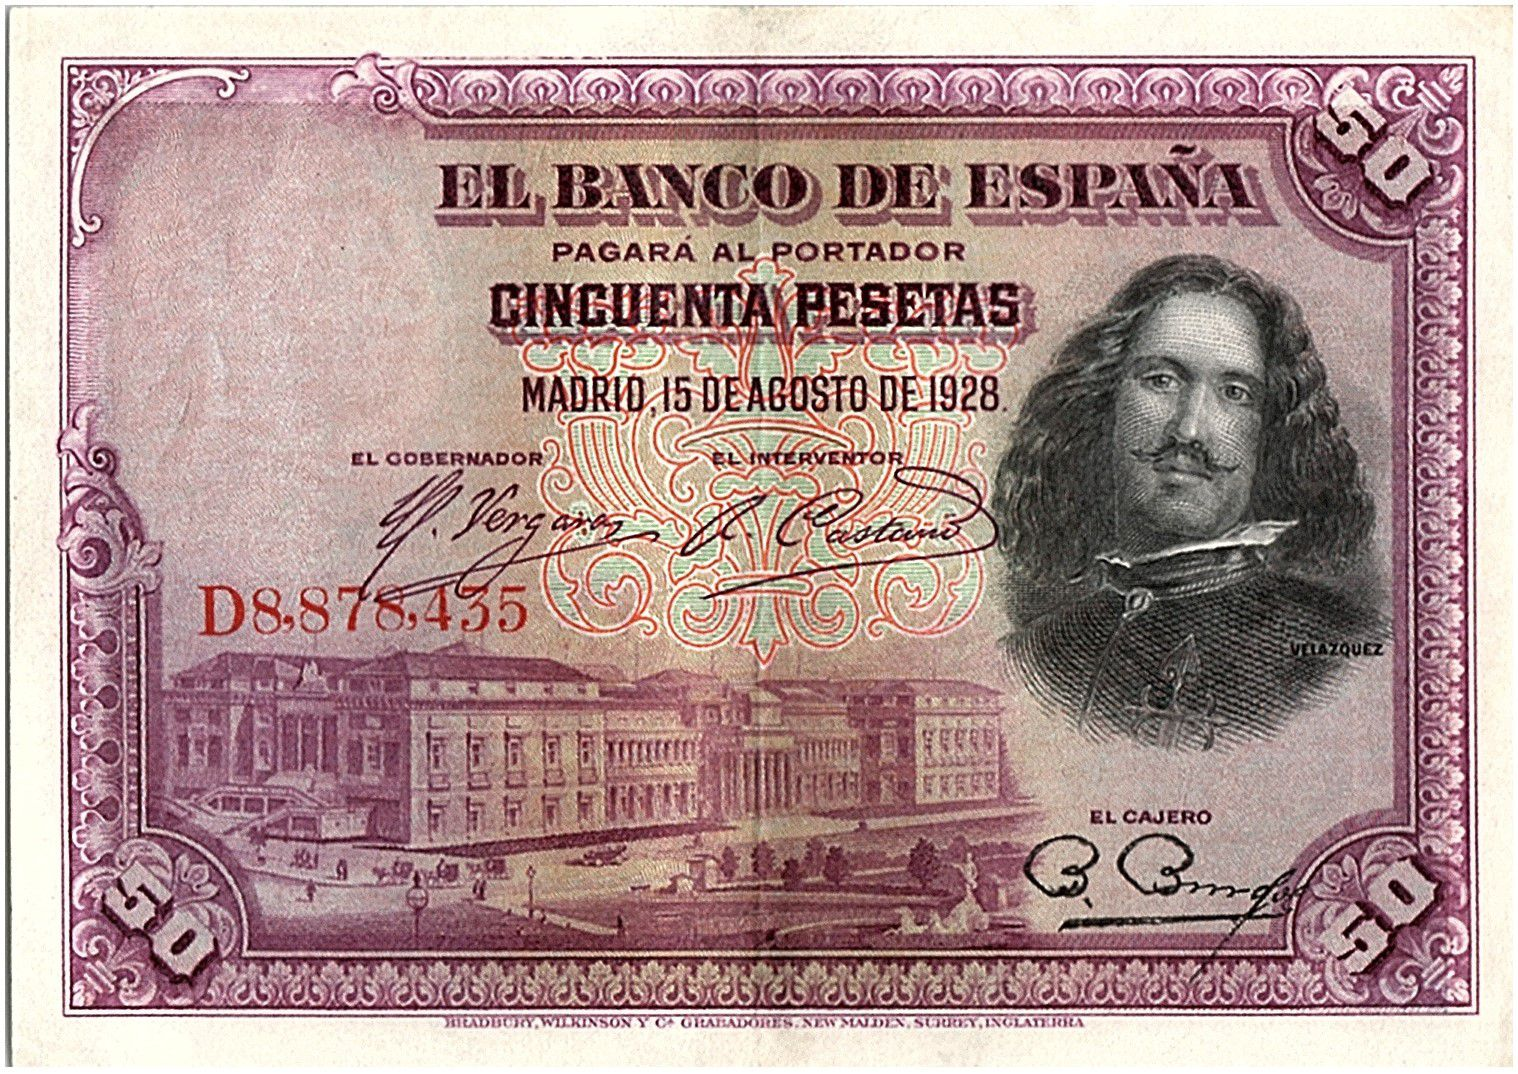 Espagne 50 Pesetas  - D. Vélasquez - 1928 - Série D - SUP / SUP + - P.75